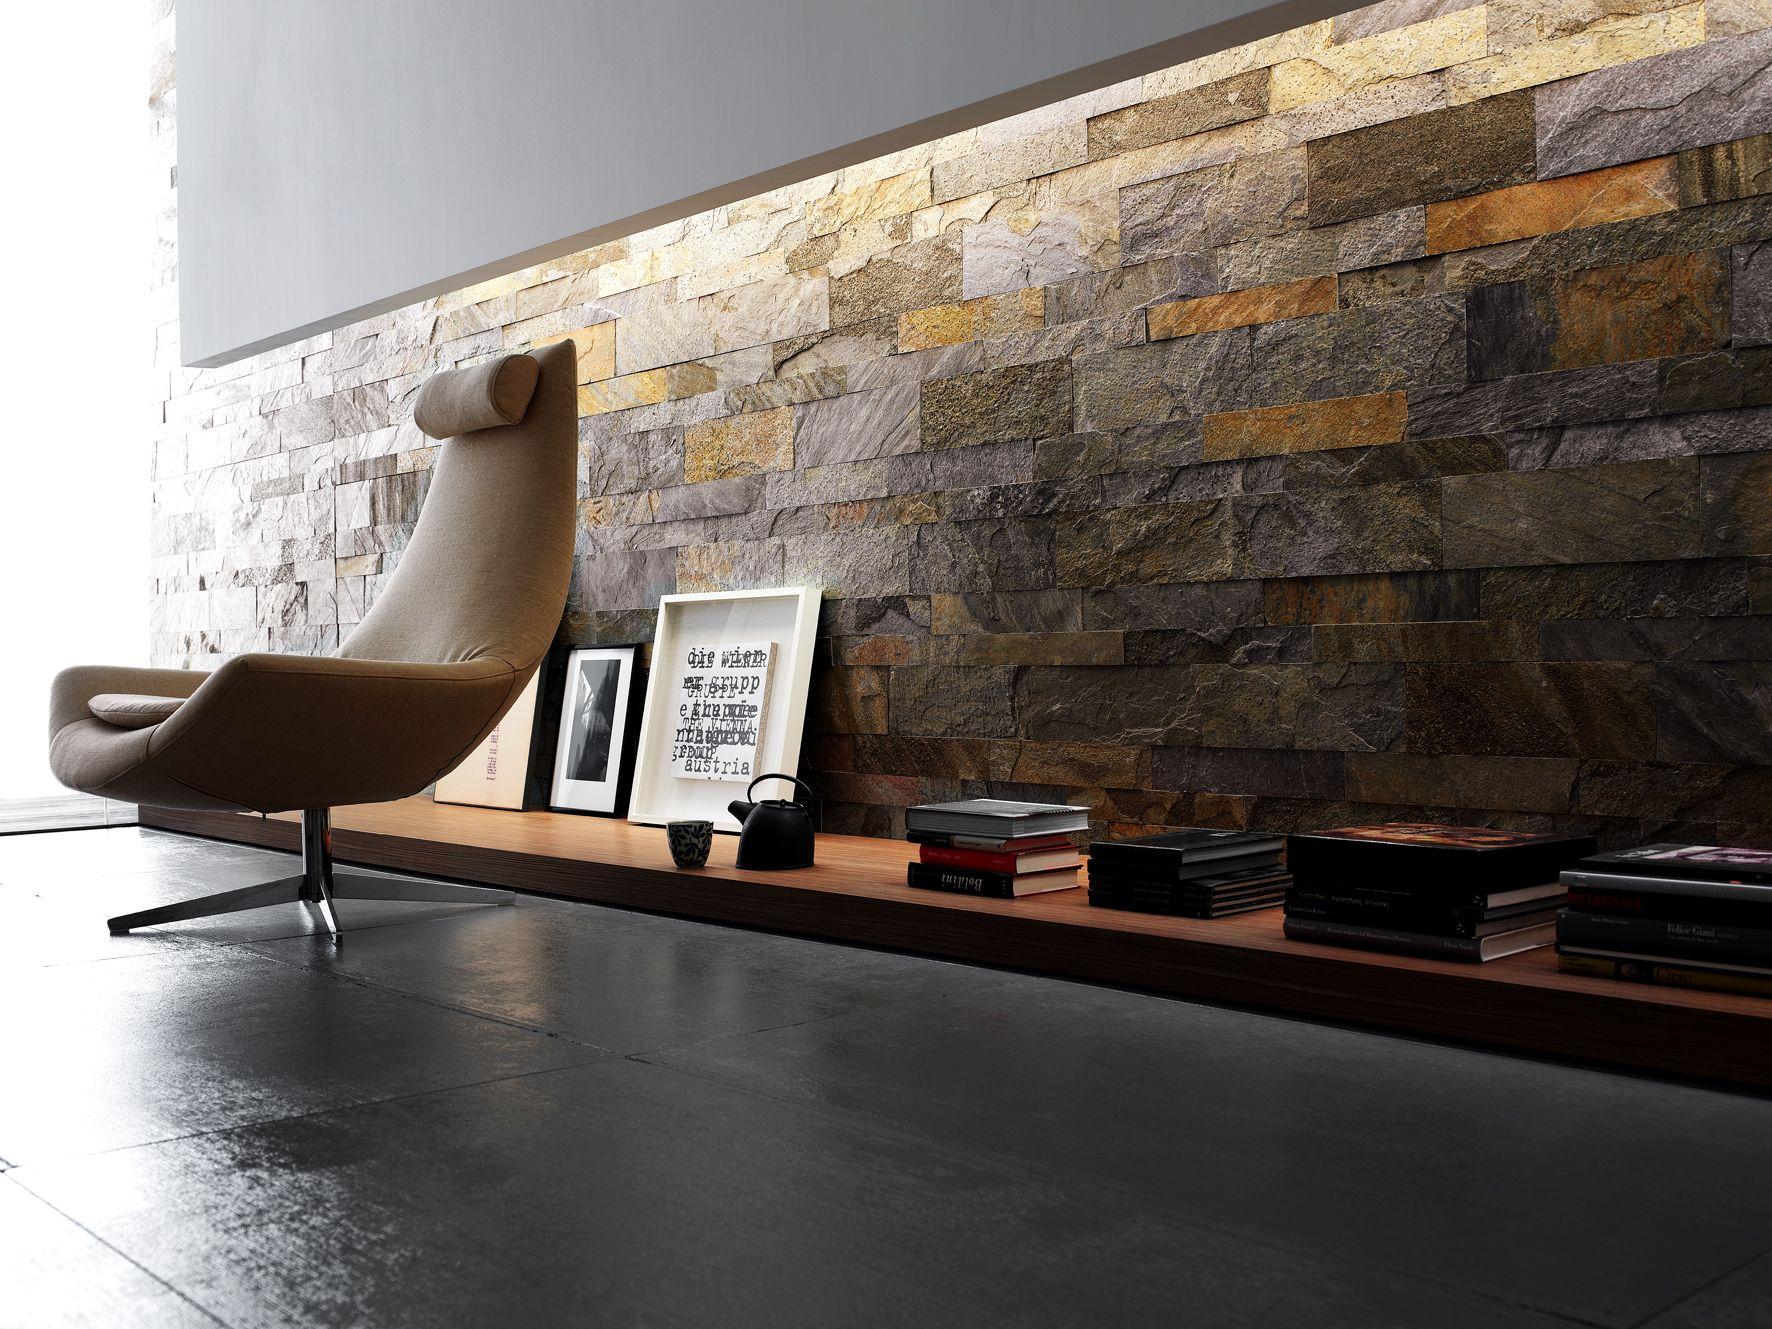 Slate Wall Floor Tiles Maxi Murales By Artesia International Slate Company Design Francesca Dondero Slate Wall Wall And Floor Tiles Stone Tile Wall #stone #wall #tiles #for #living #room